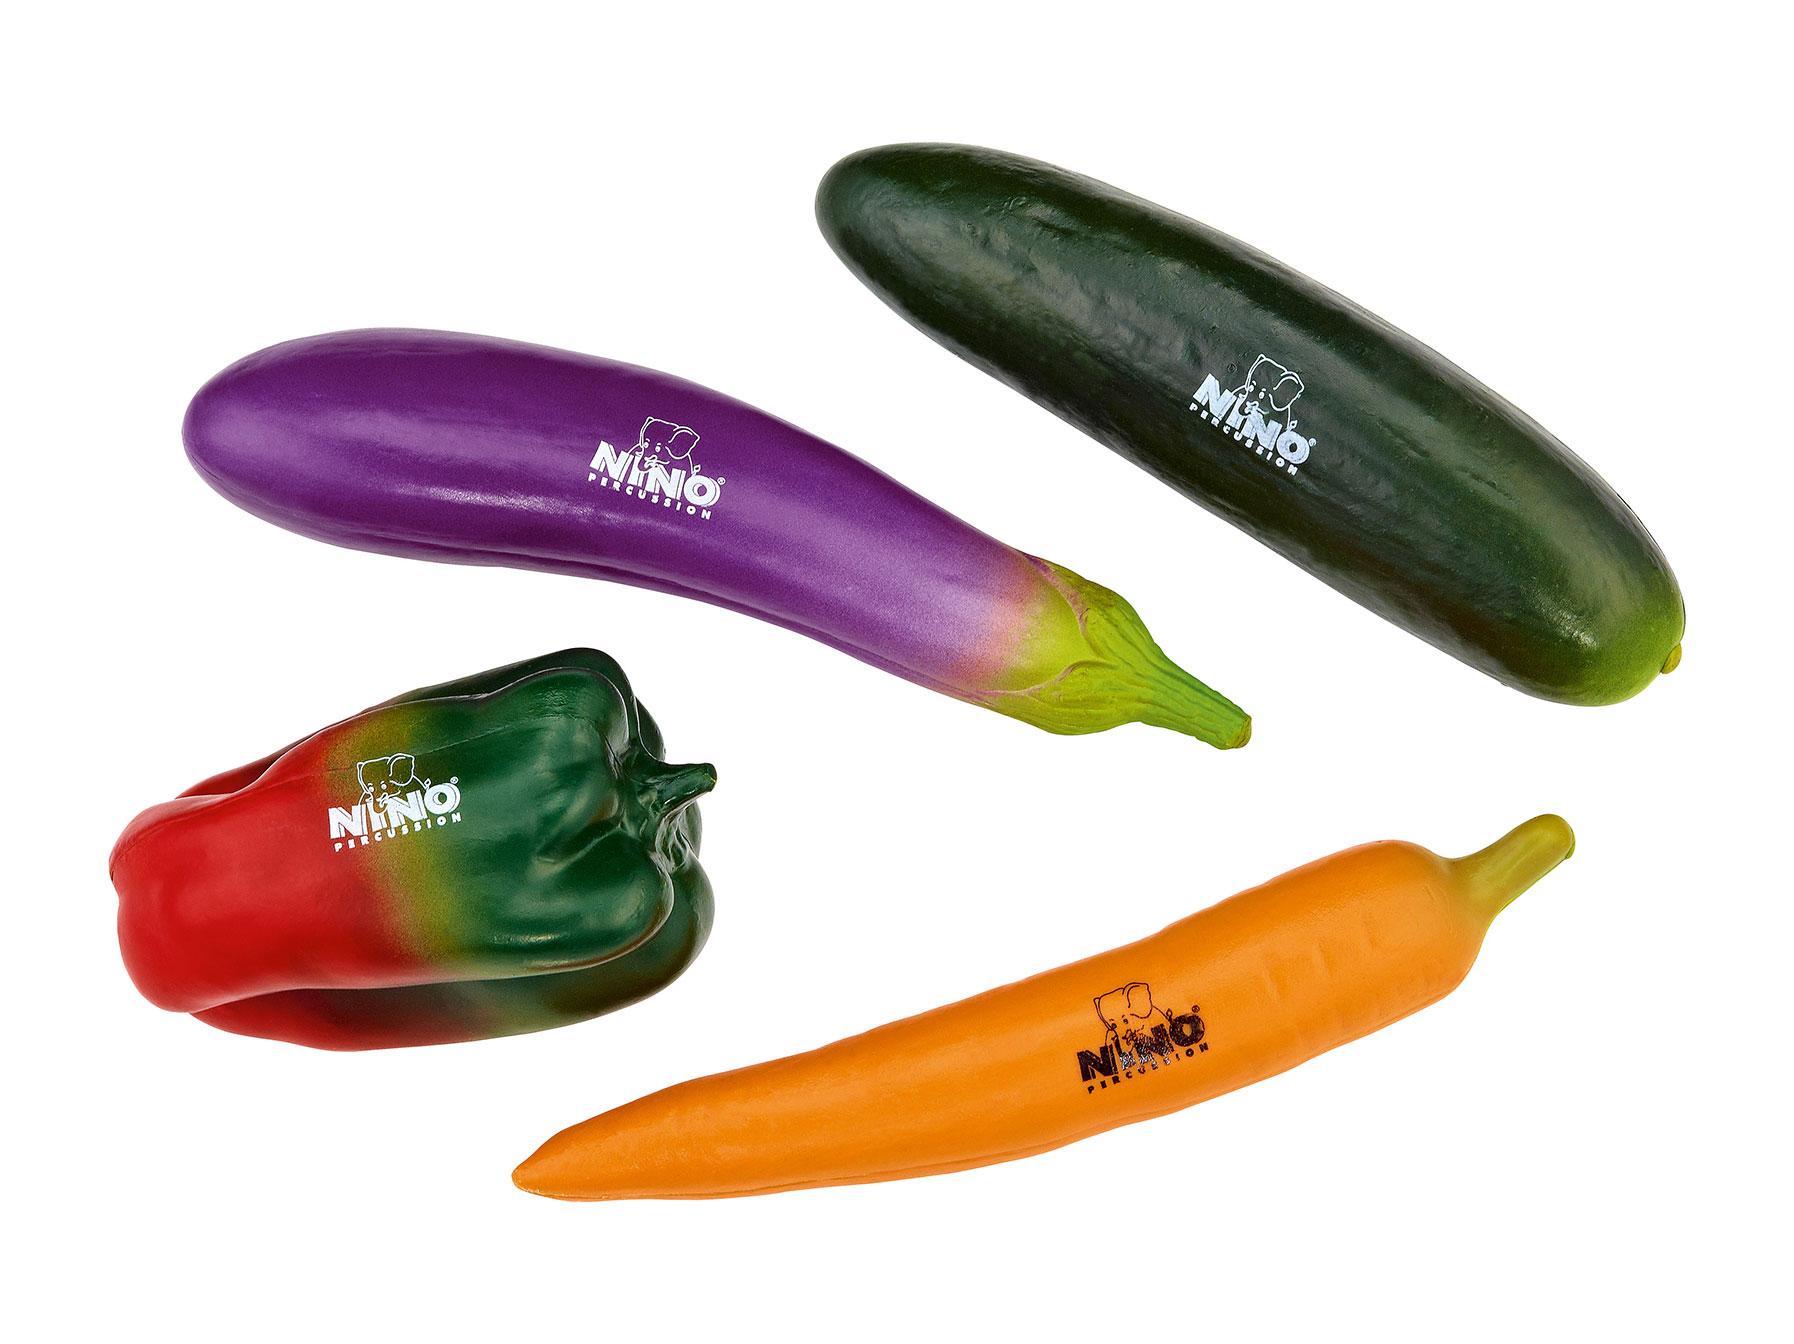 Image of   Meinl Nino rasle frugt eller grøntsag Agurk